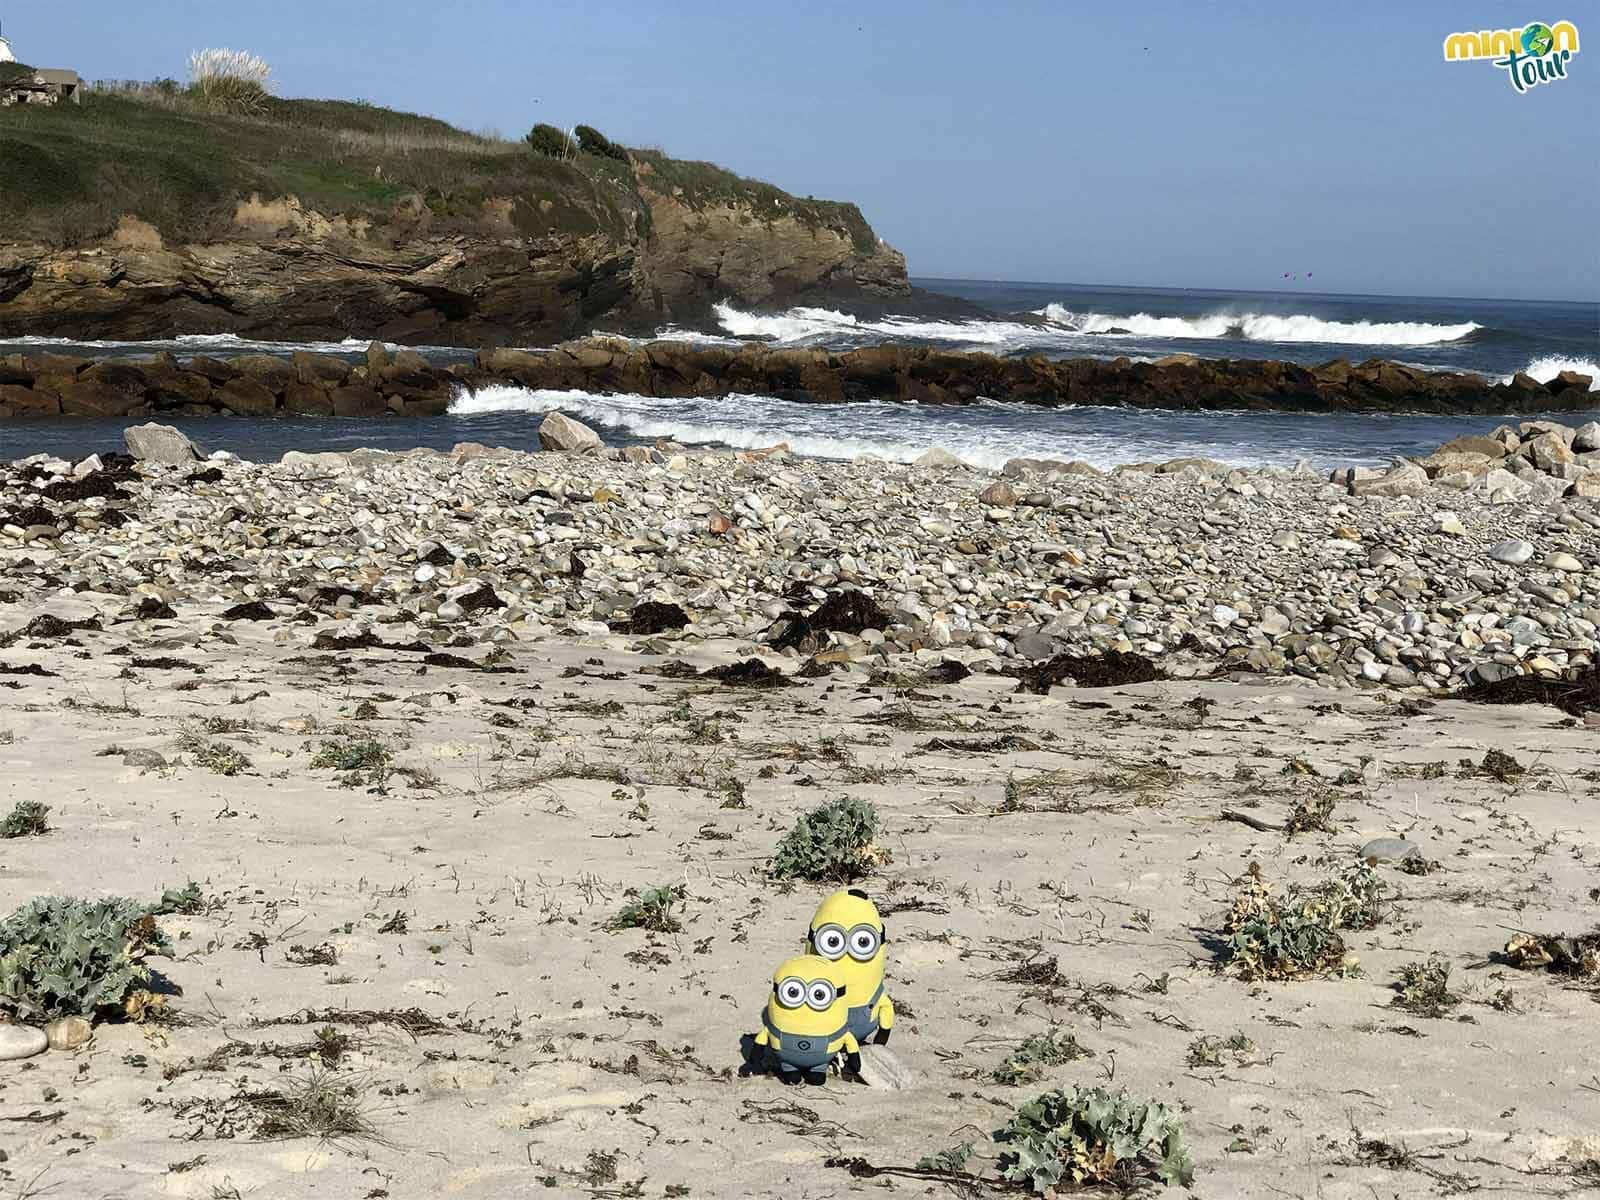 Buscando oro en la Playa Pampillosa